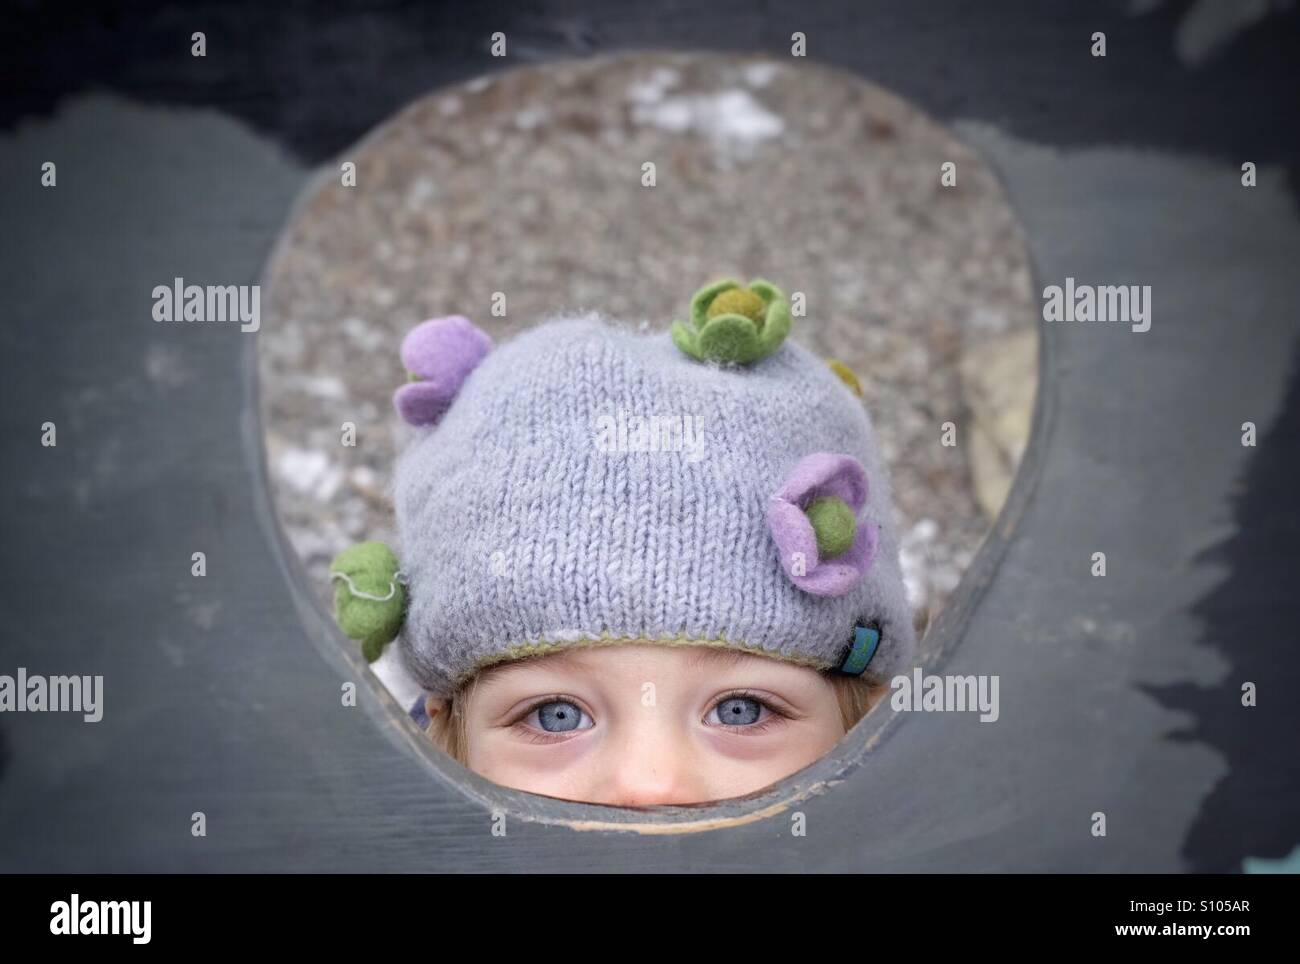 Una chica joven peeking a través de un orificio. Imagen De Stock